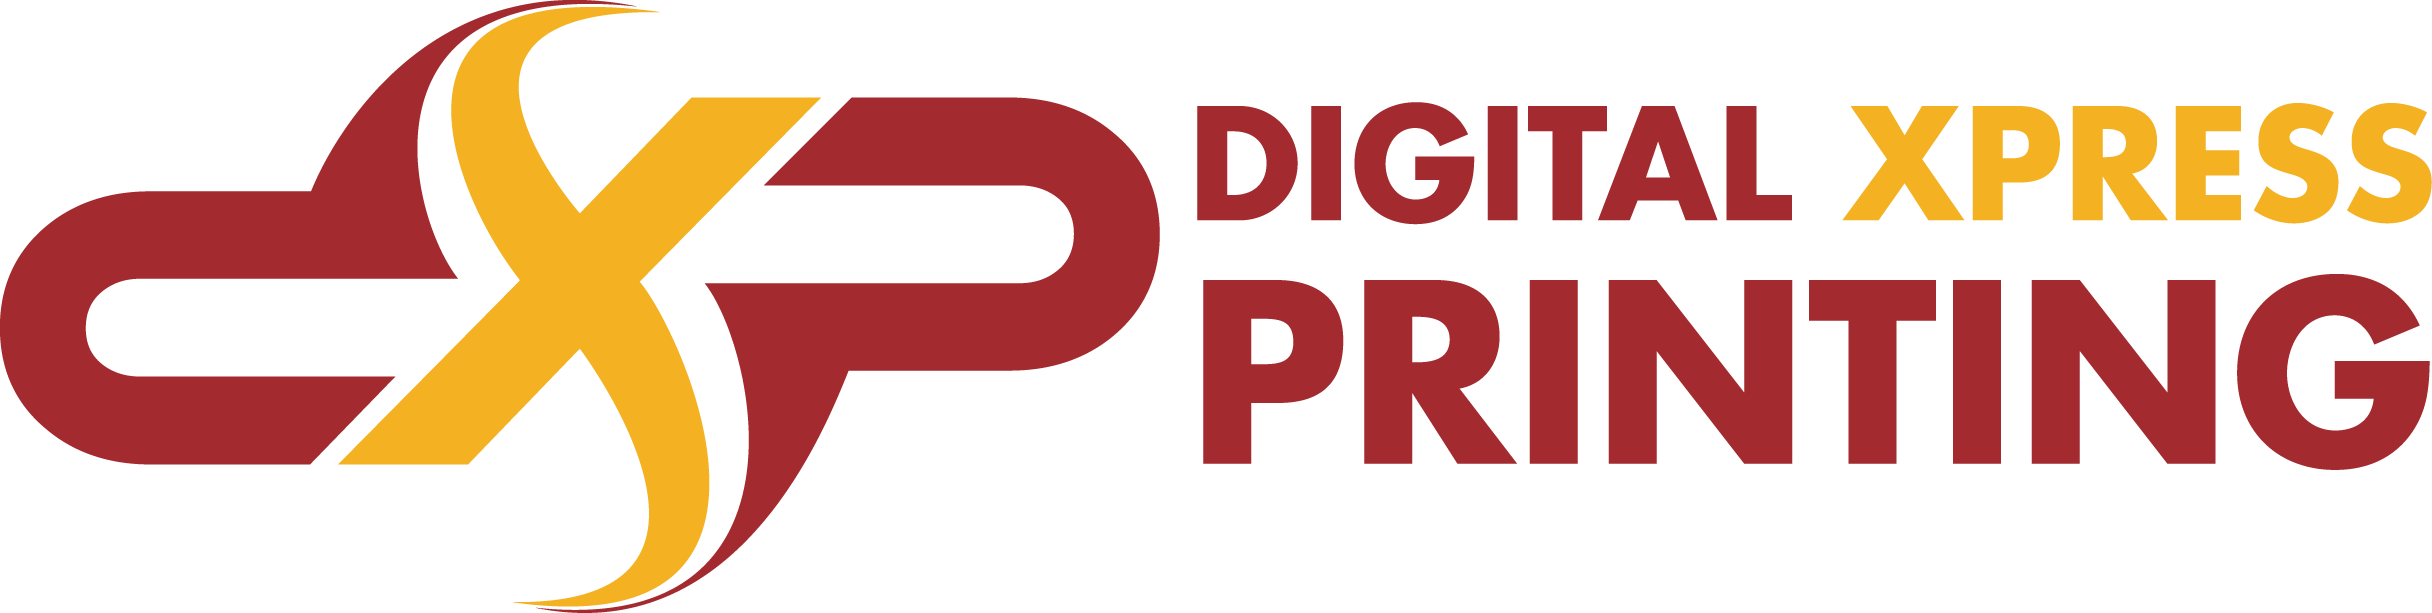 NewsVideos - Digital Xpress Printing, Norcross, GA